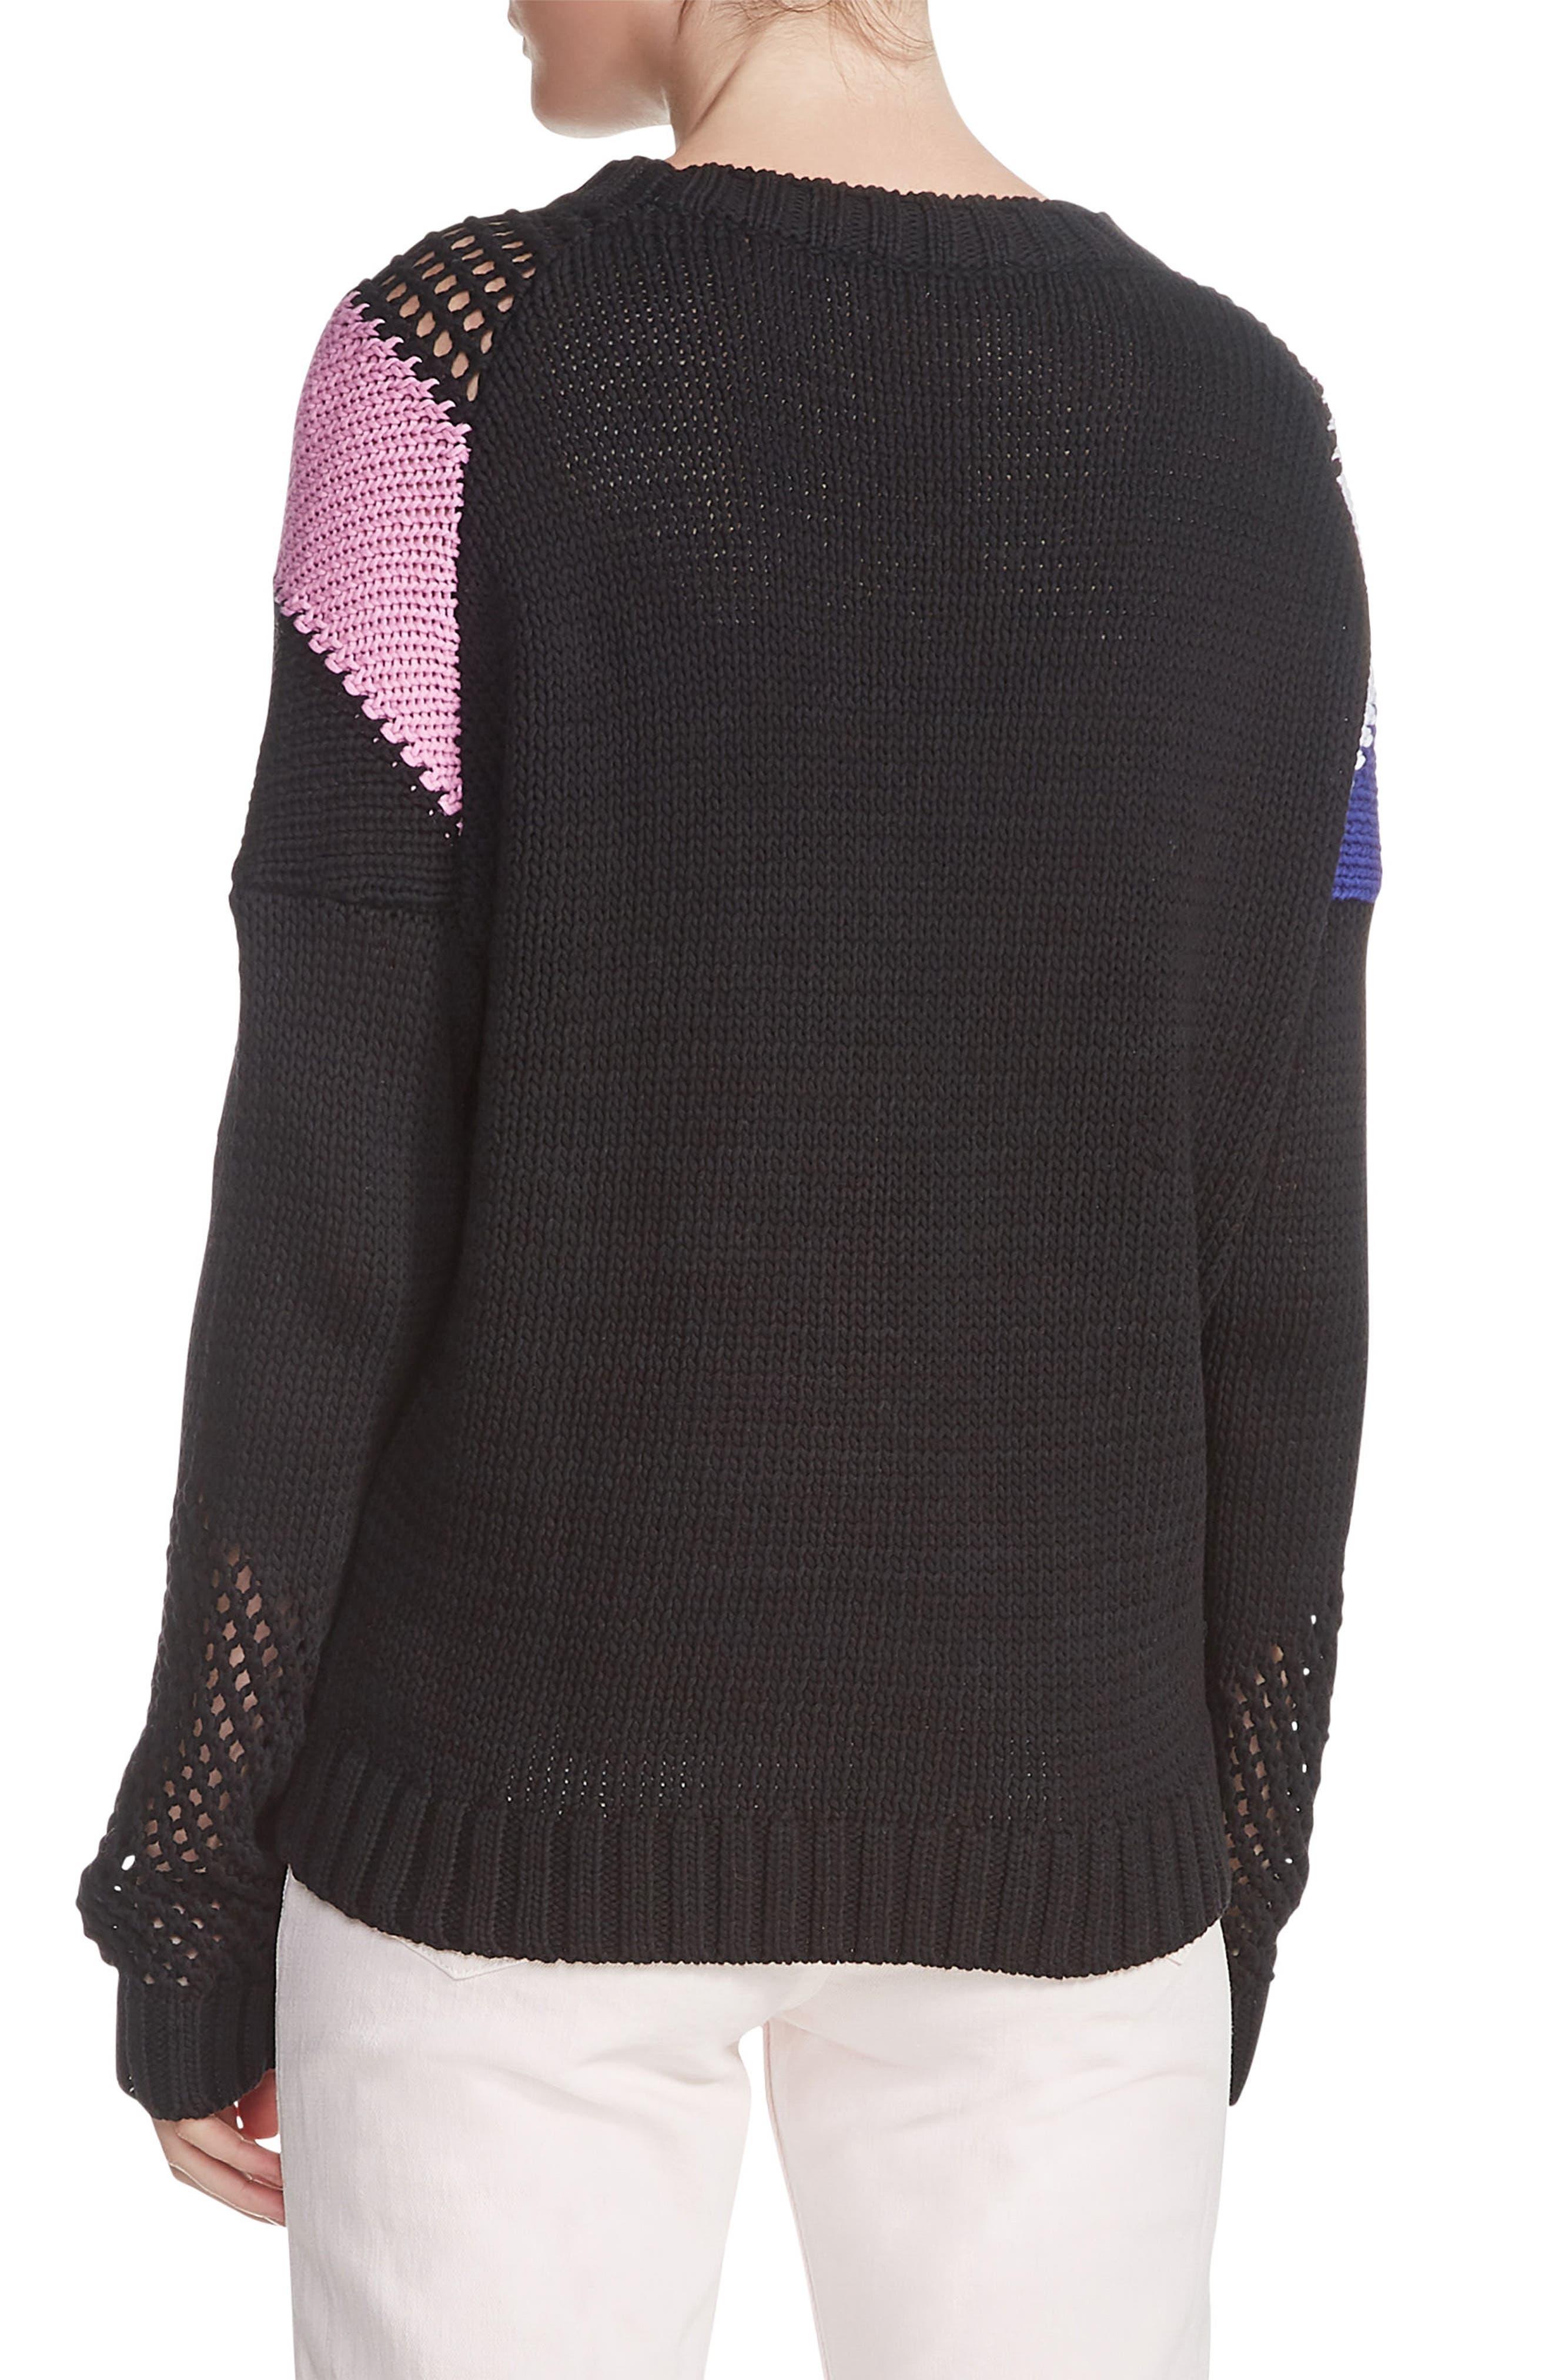 Marylene Sweater,                             Alternate thumbnail 2, color,                             001